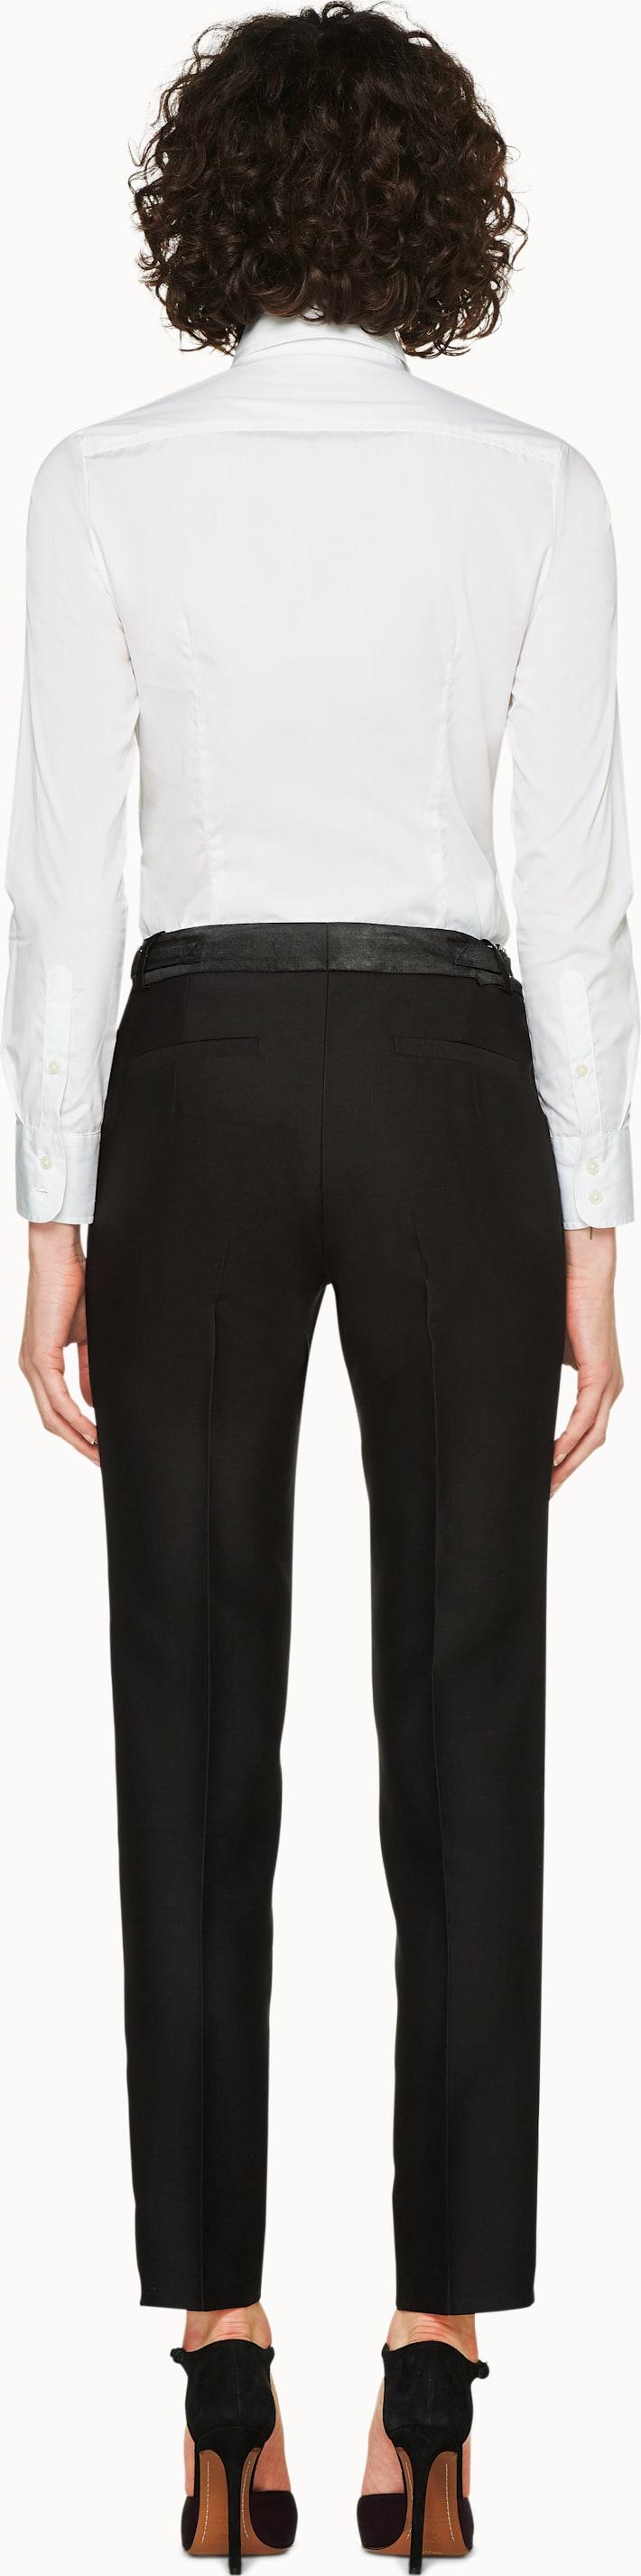 Robin Black  Tux Trousers